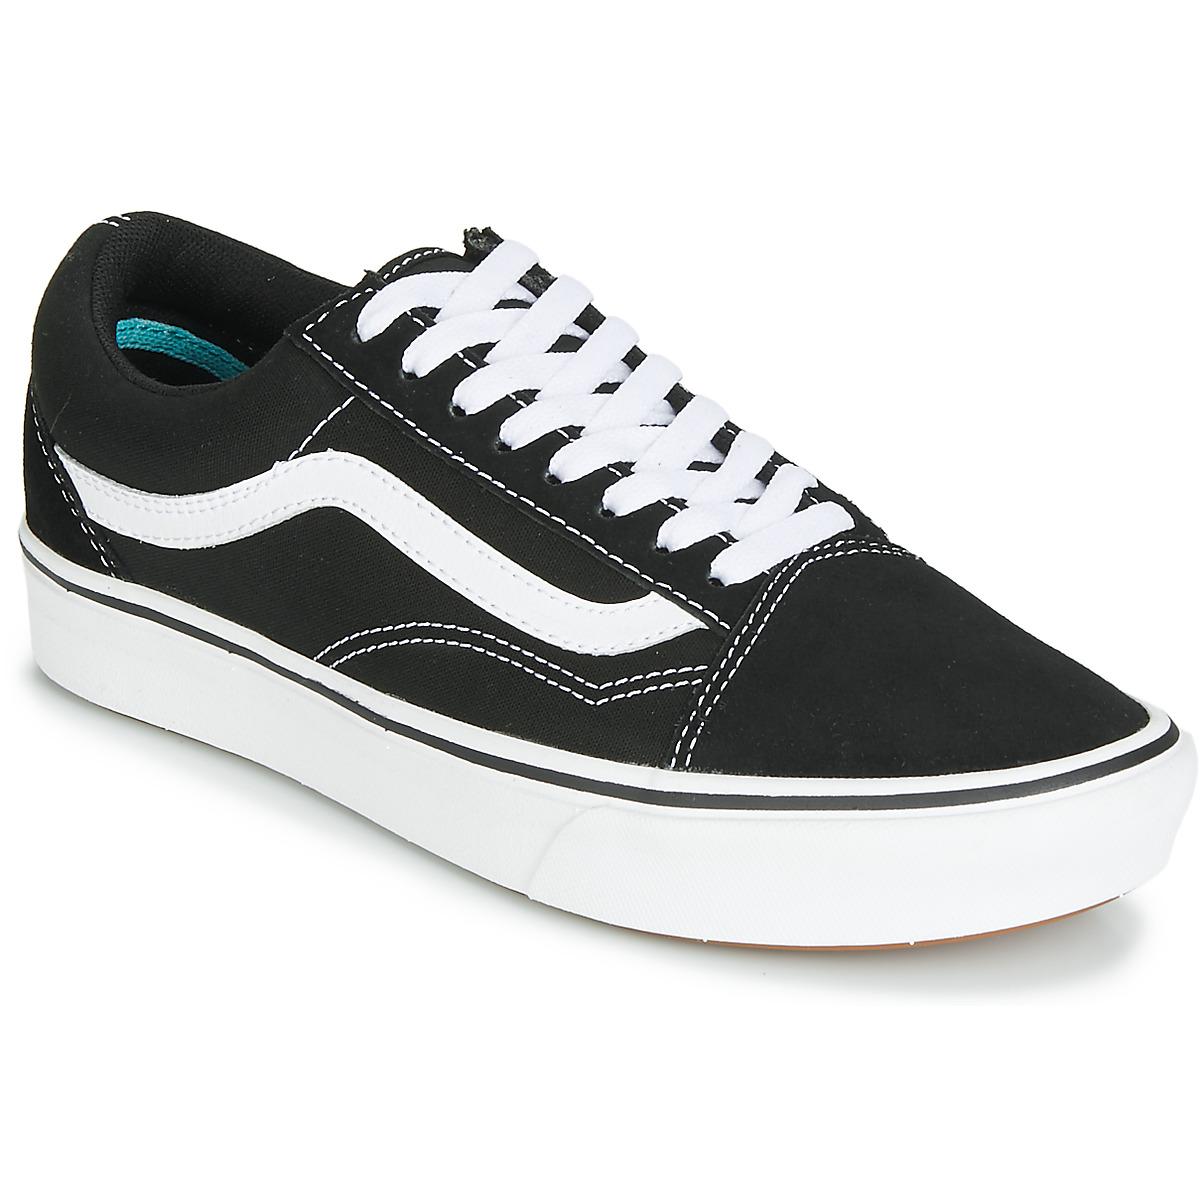 Vans COMFYCUSH OLD SKOOL Black / White